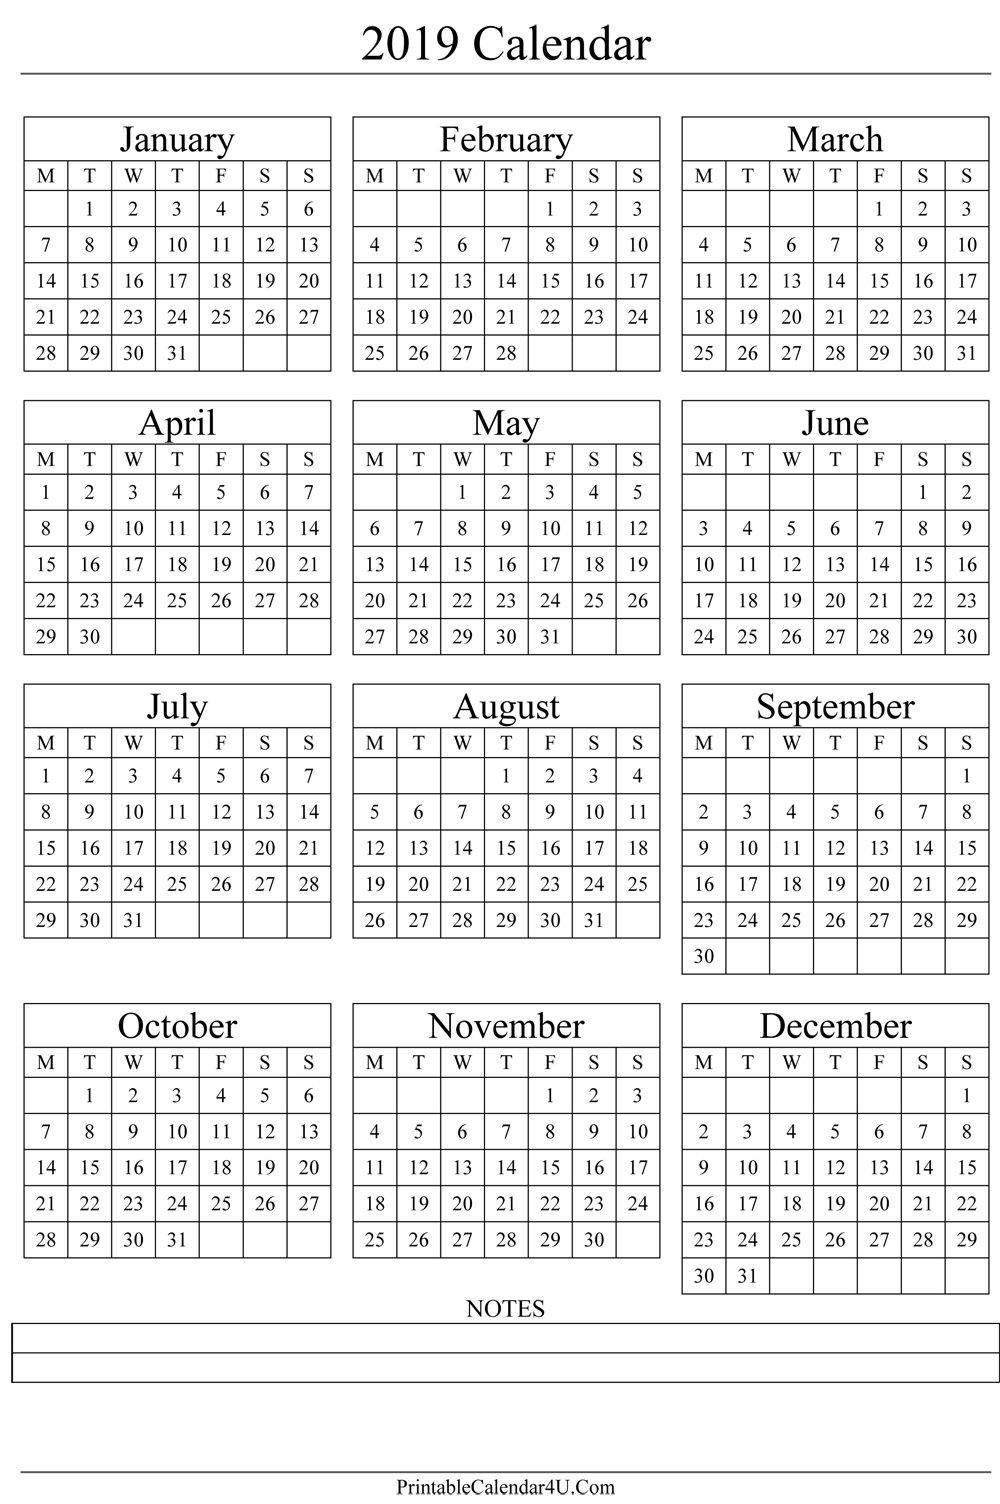 Annual Calendar 2019 Portrait Printable Calendar 2017 2018 2019 Calendar 2019 Printable